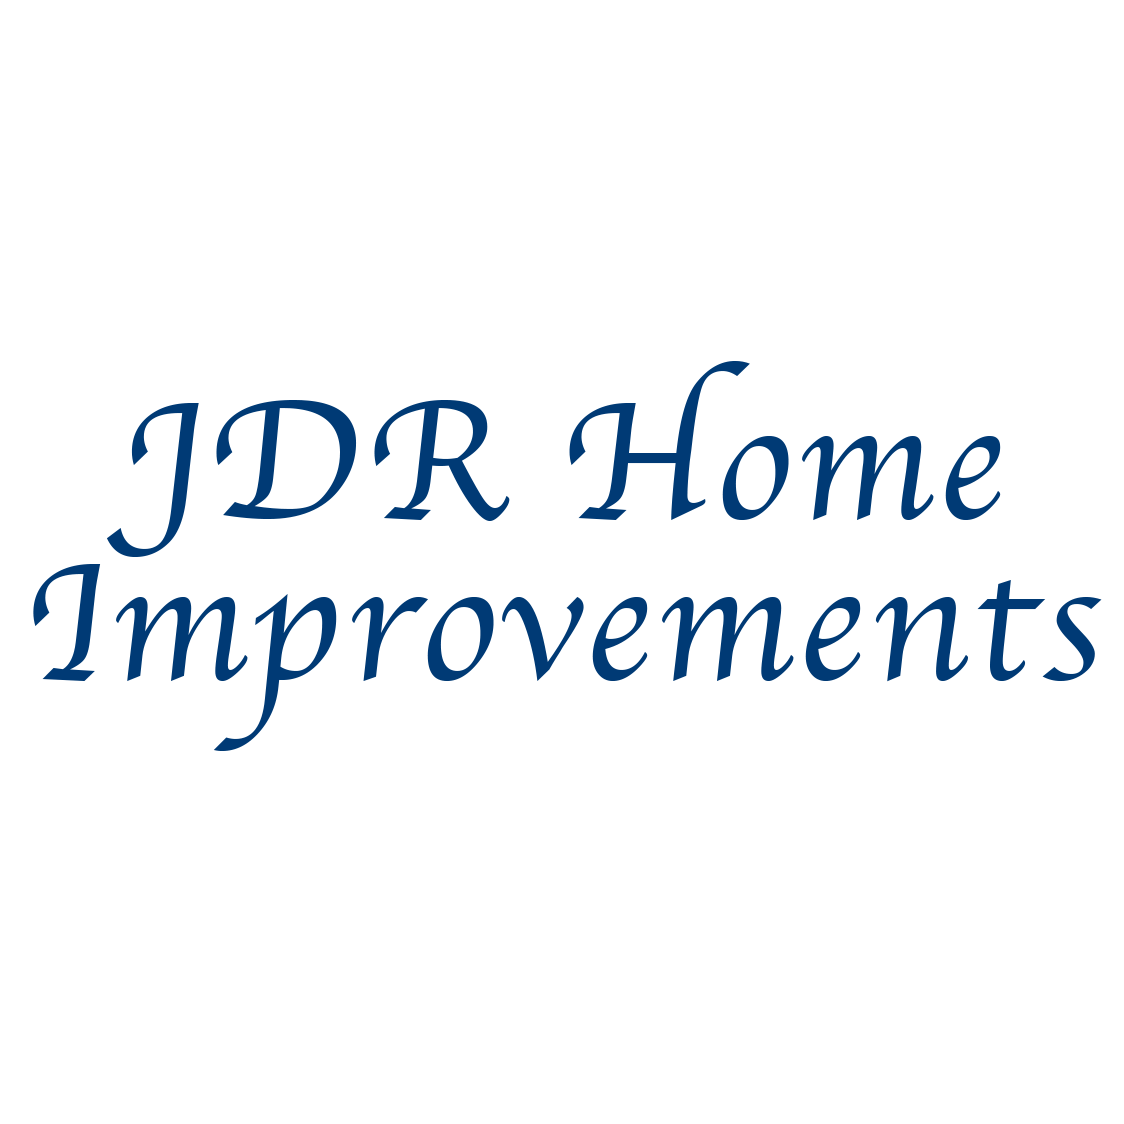 JDR Home Improvements